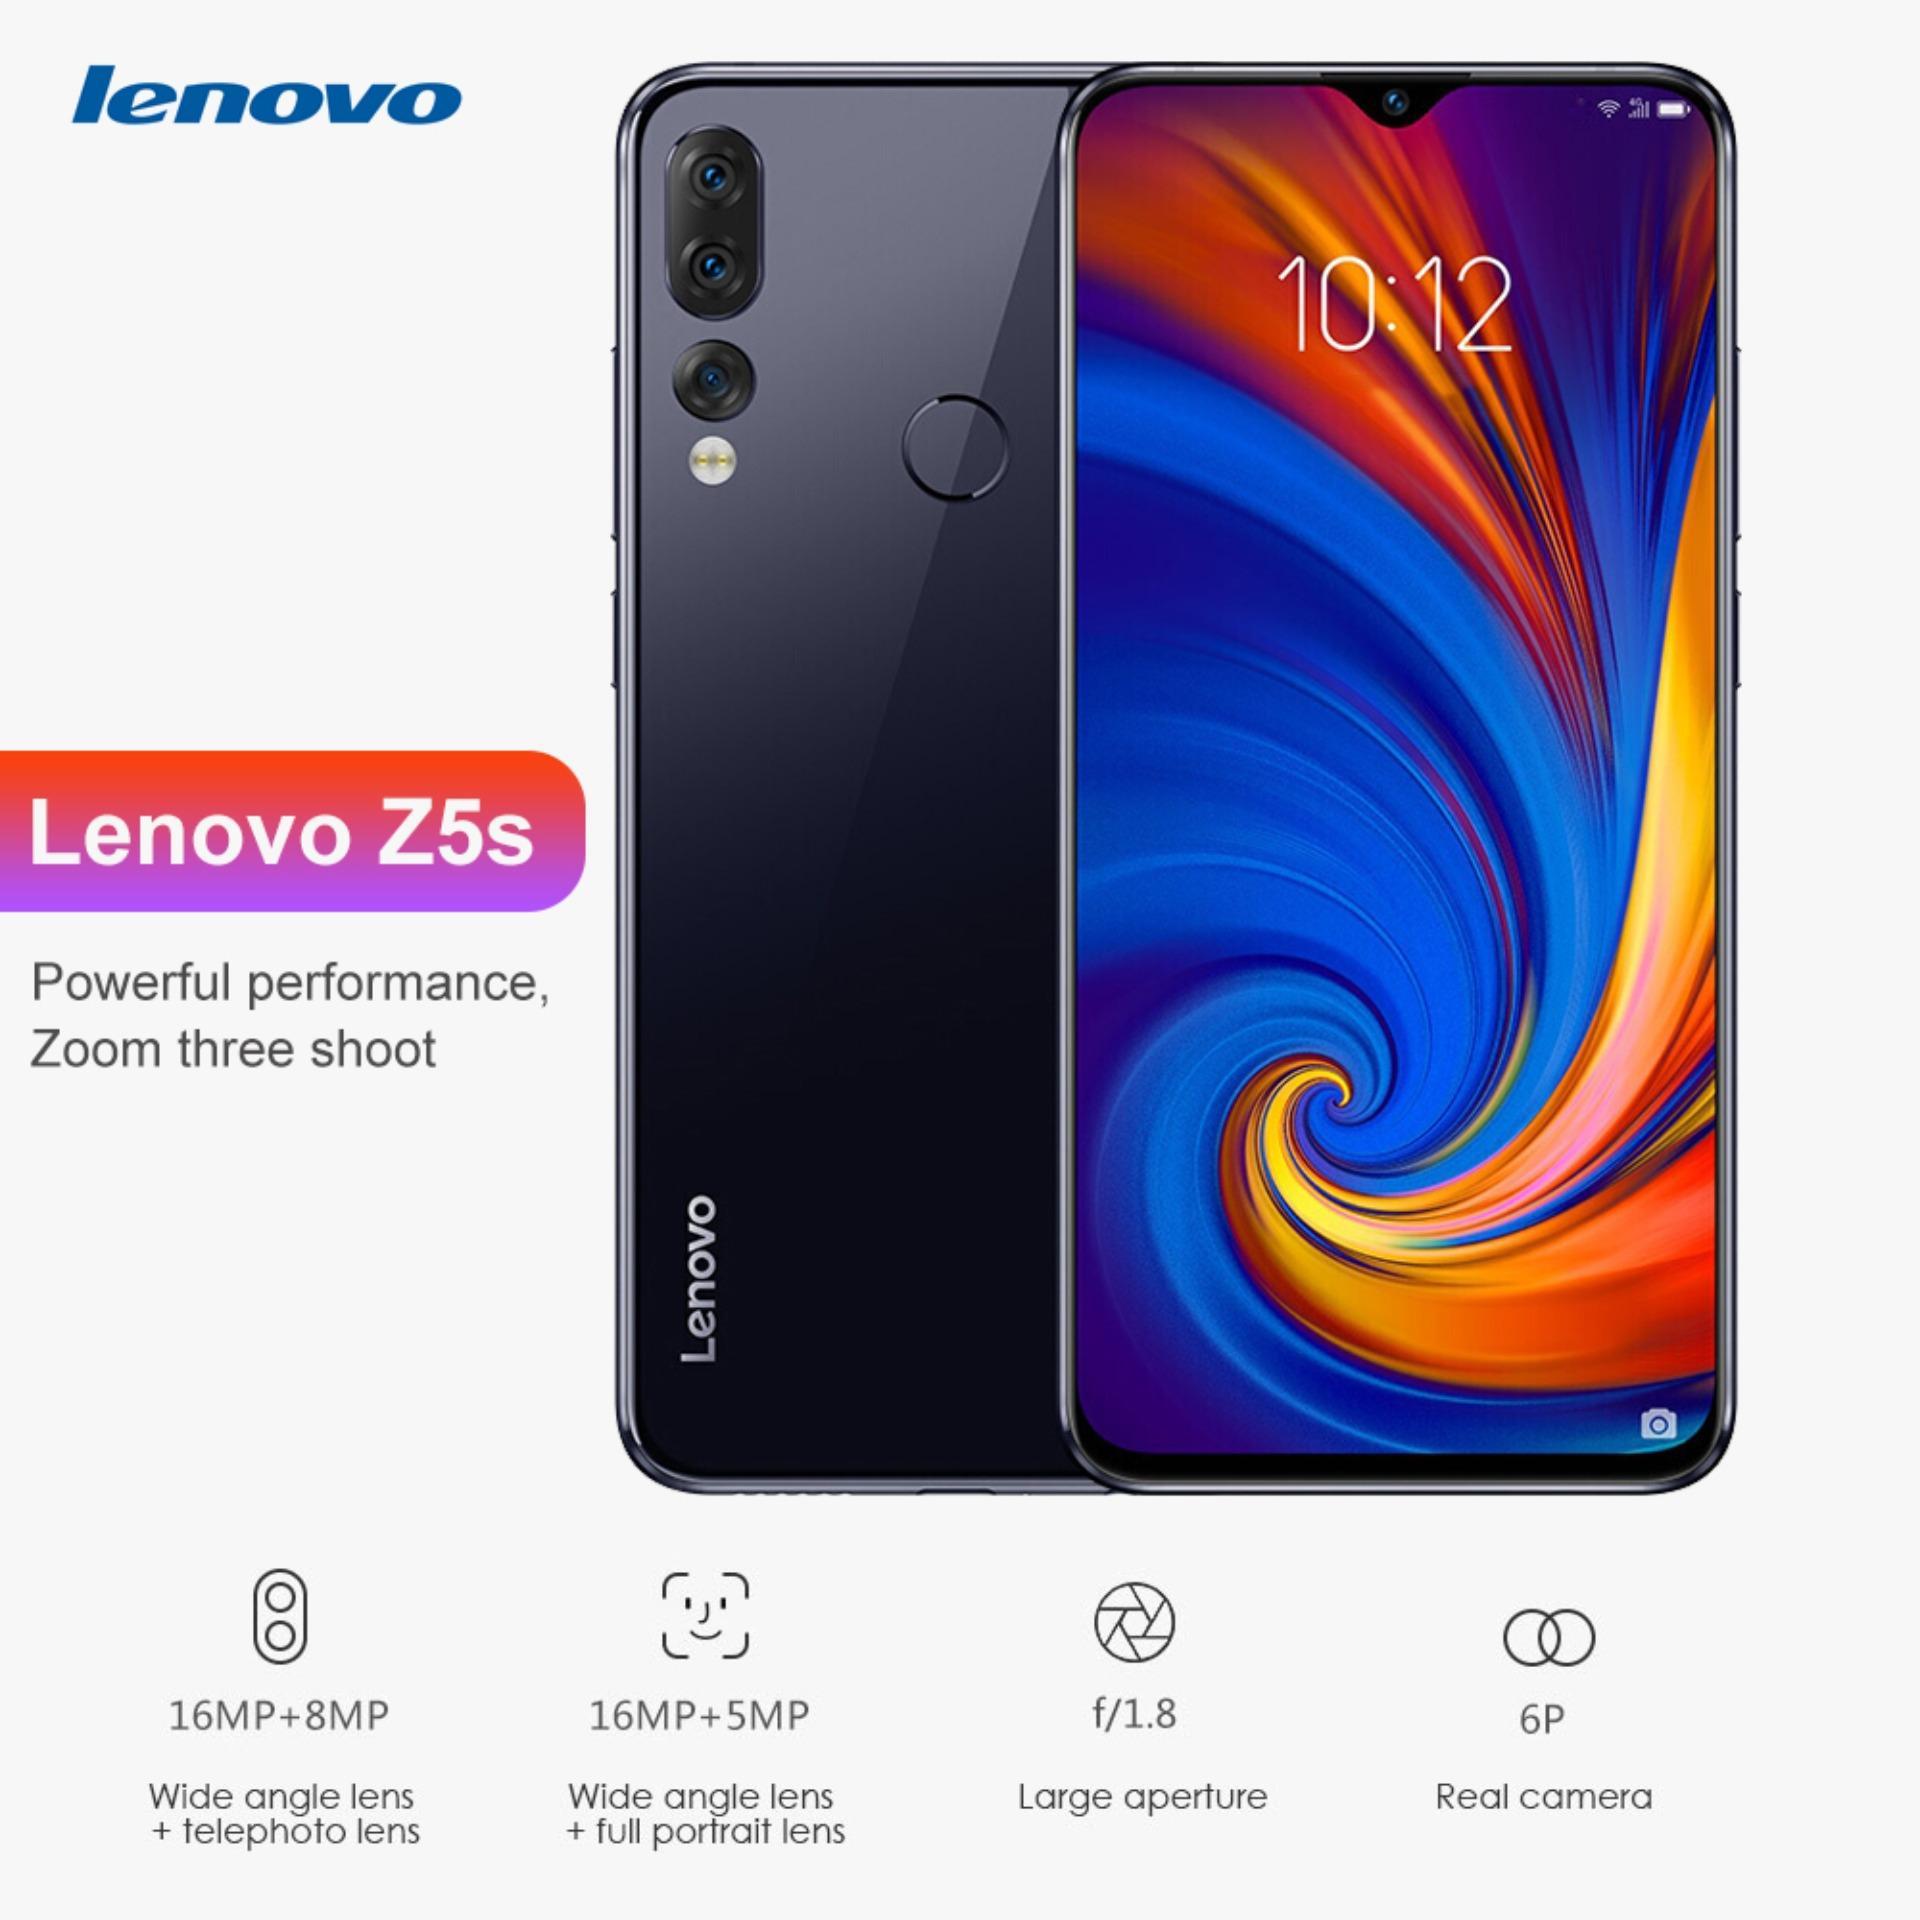 Original Lenovo Z5s 4G Smart Phone 6 3 inch Android P Qualcomm Snapdragon  710 Octa Core 4GB RAM 64GB ROM 16 0MP Front Camera Fingerprint Sensor